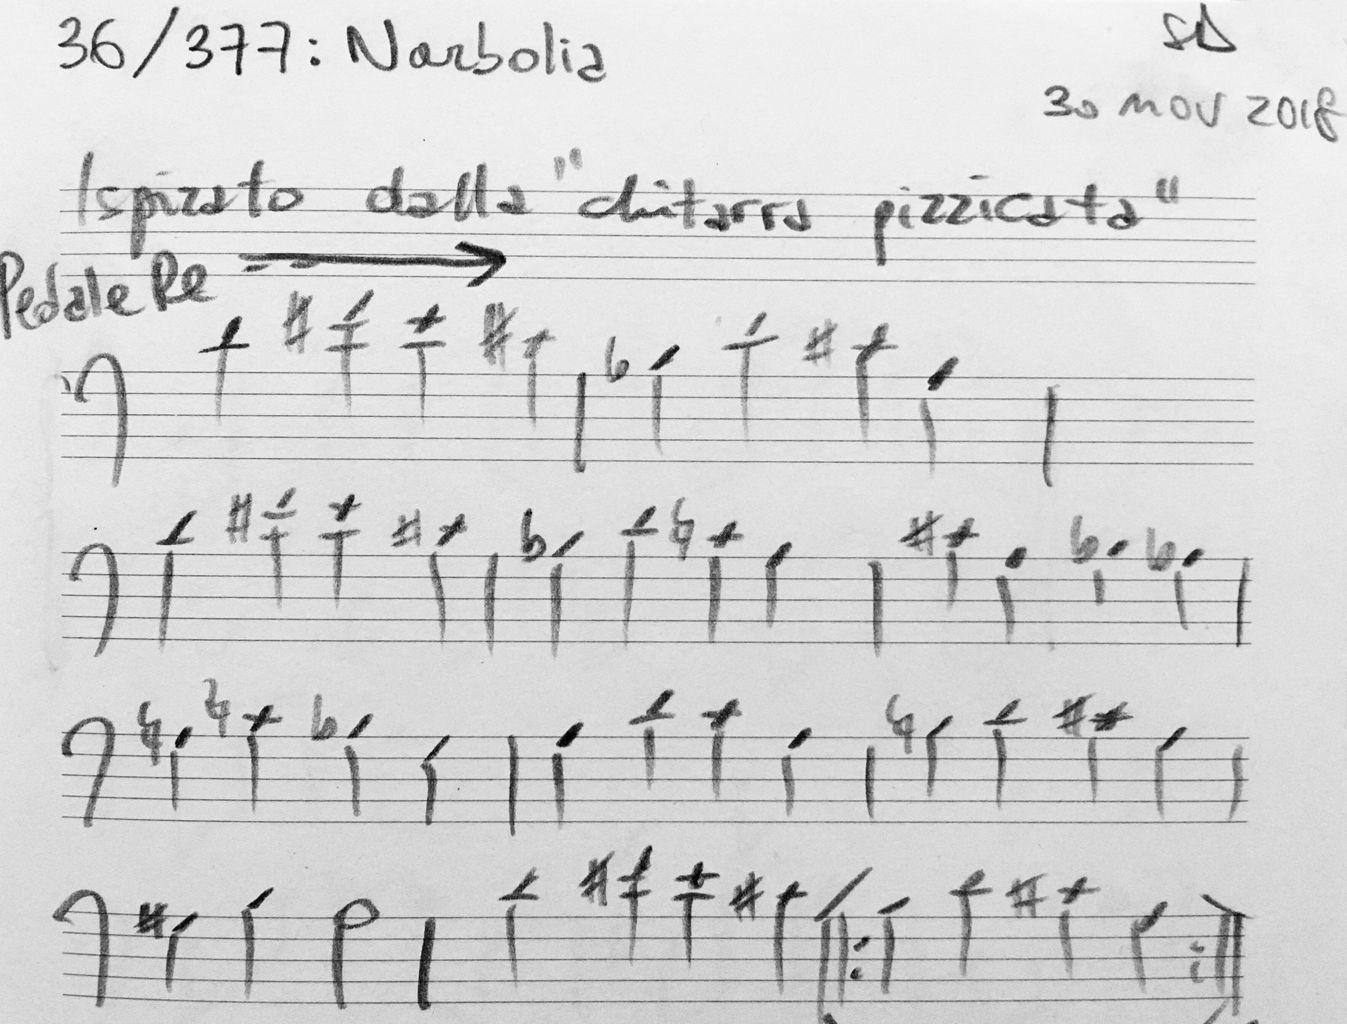 036-Narbolia-Score